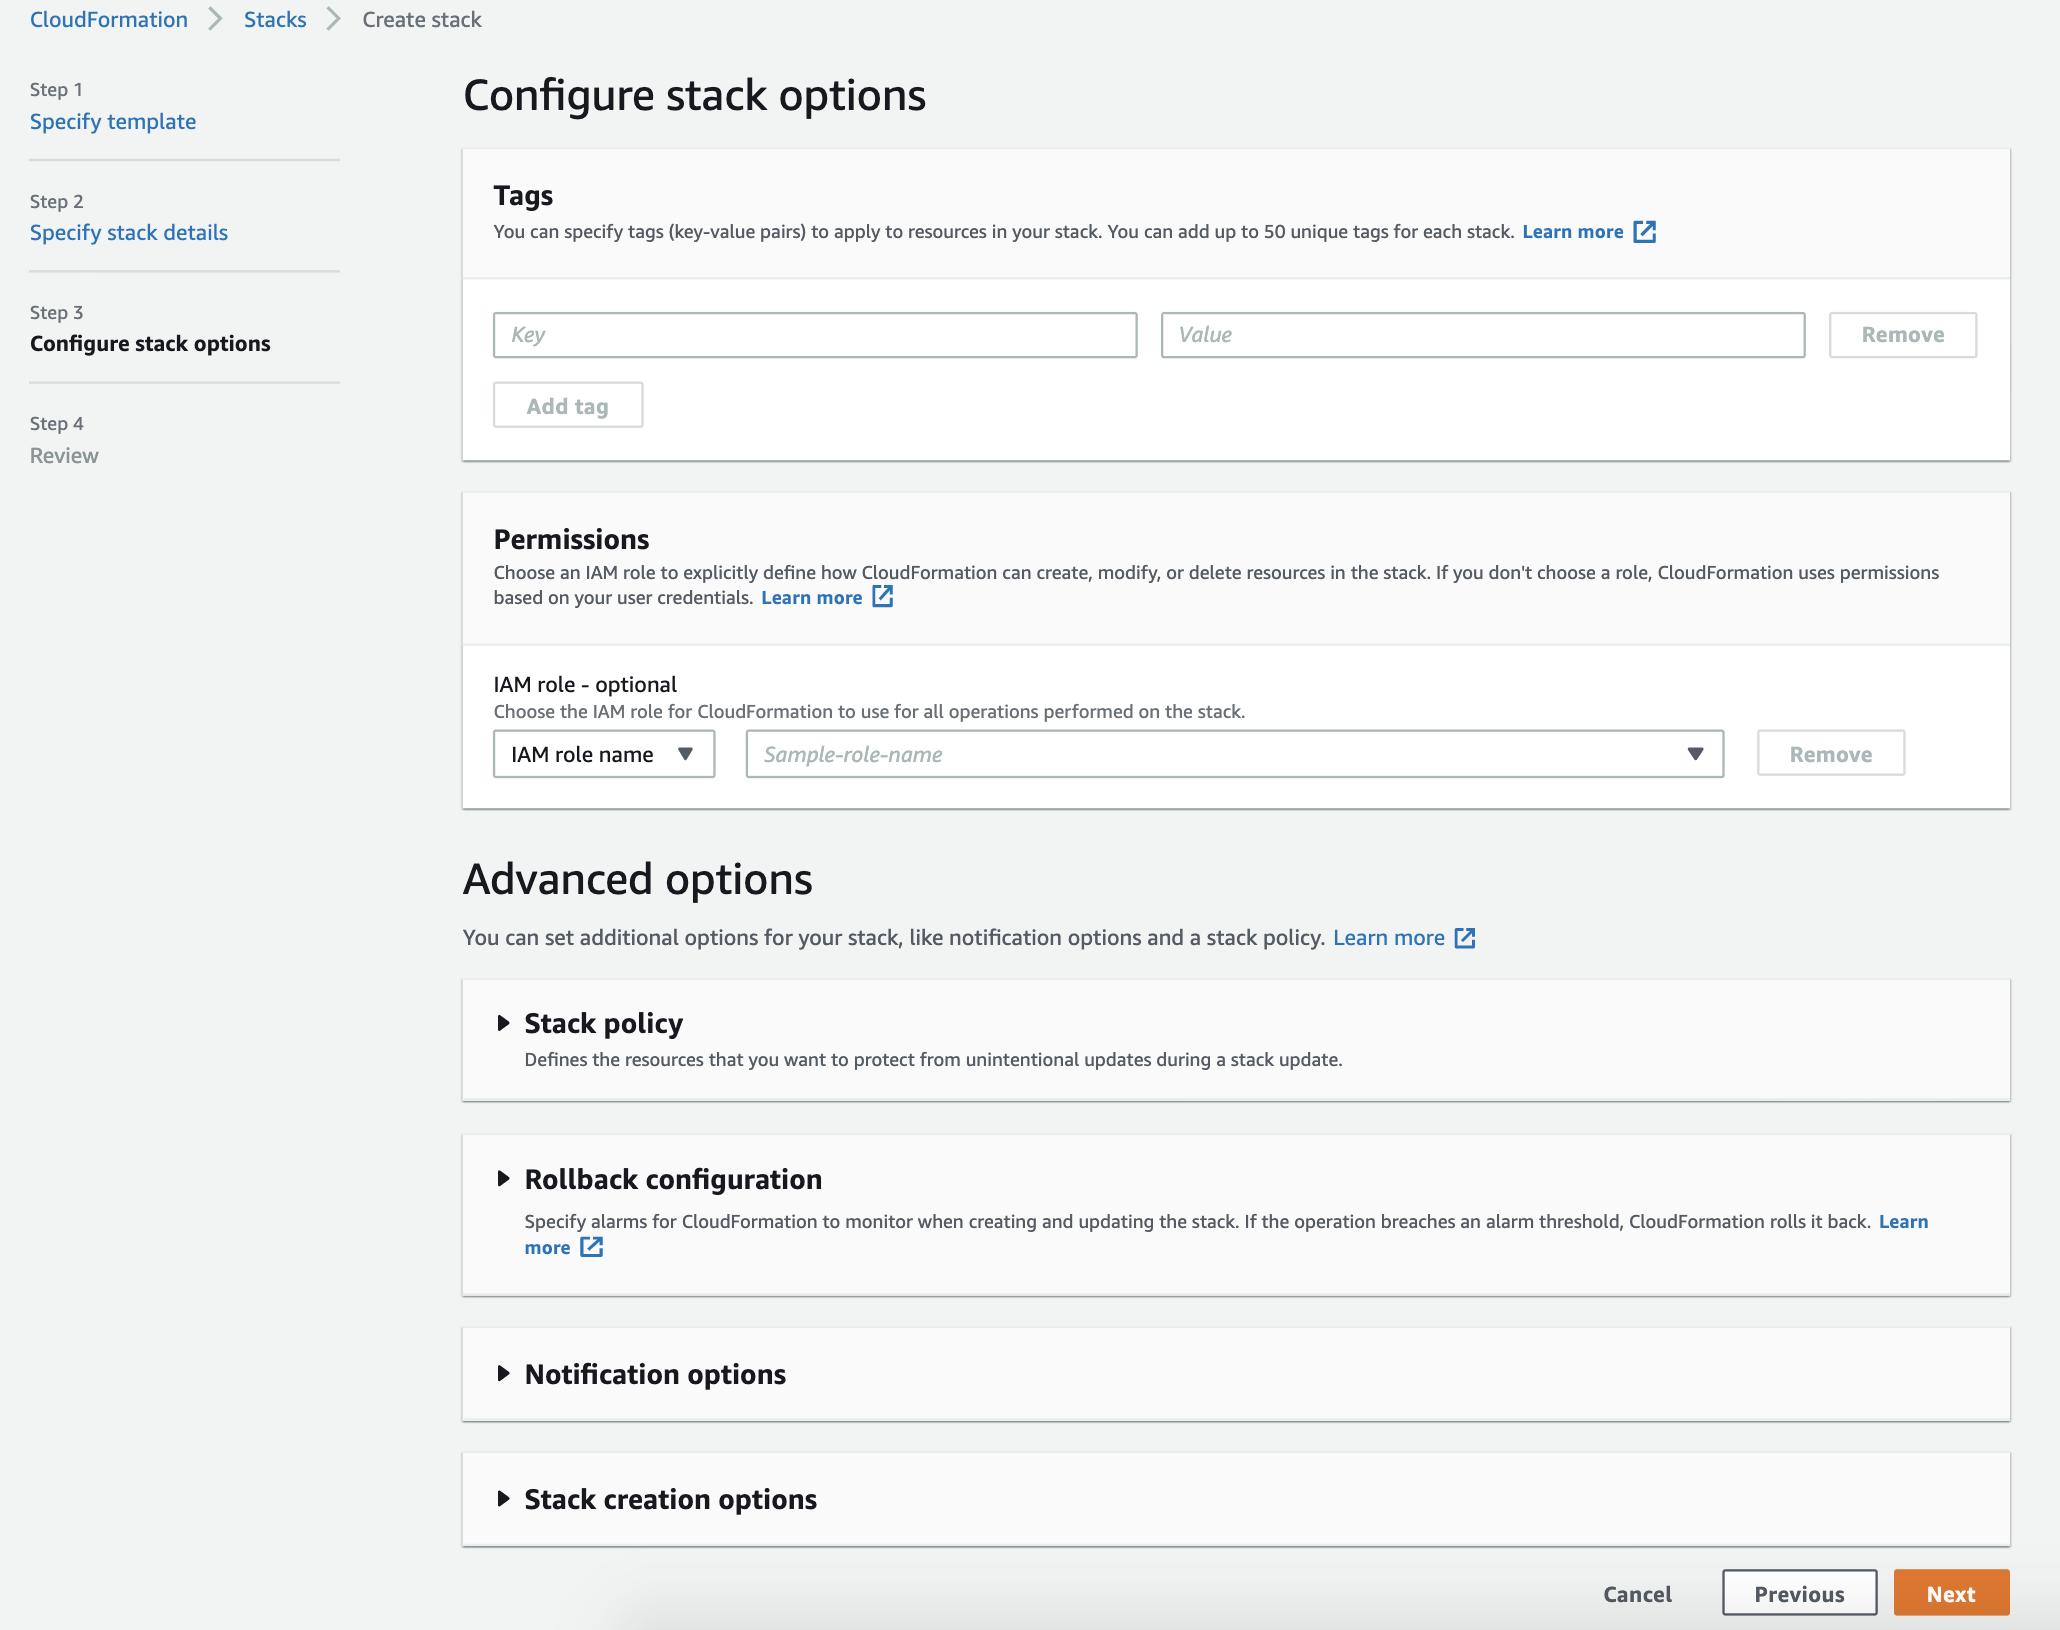 Configure stack options